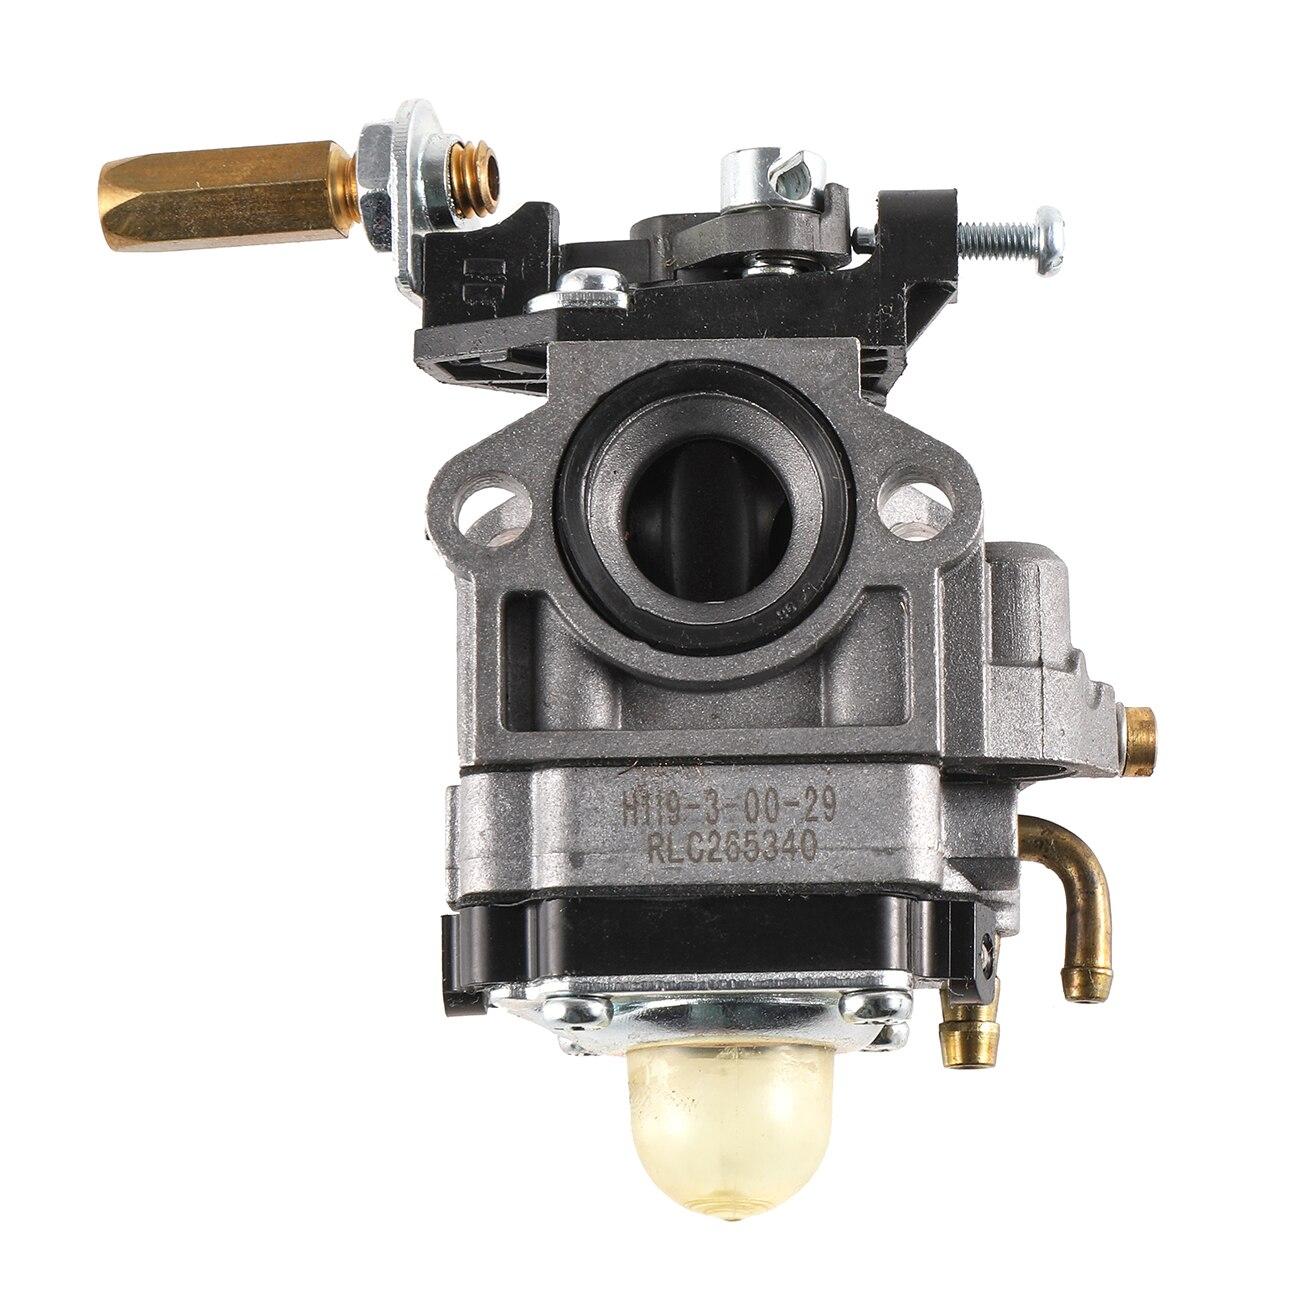 Brush Cutter Trimmer Carb Carburetor For Husqvarna 143RII Replace